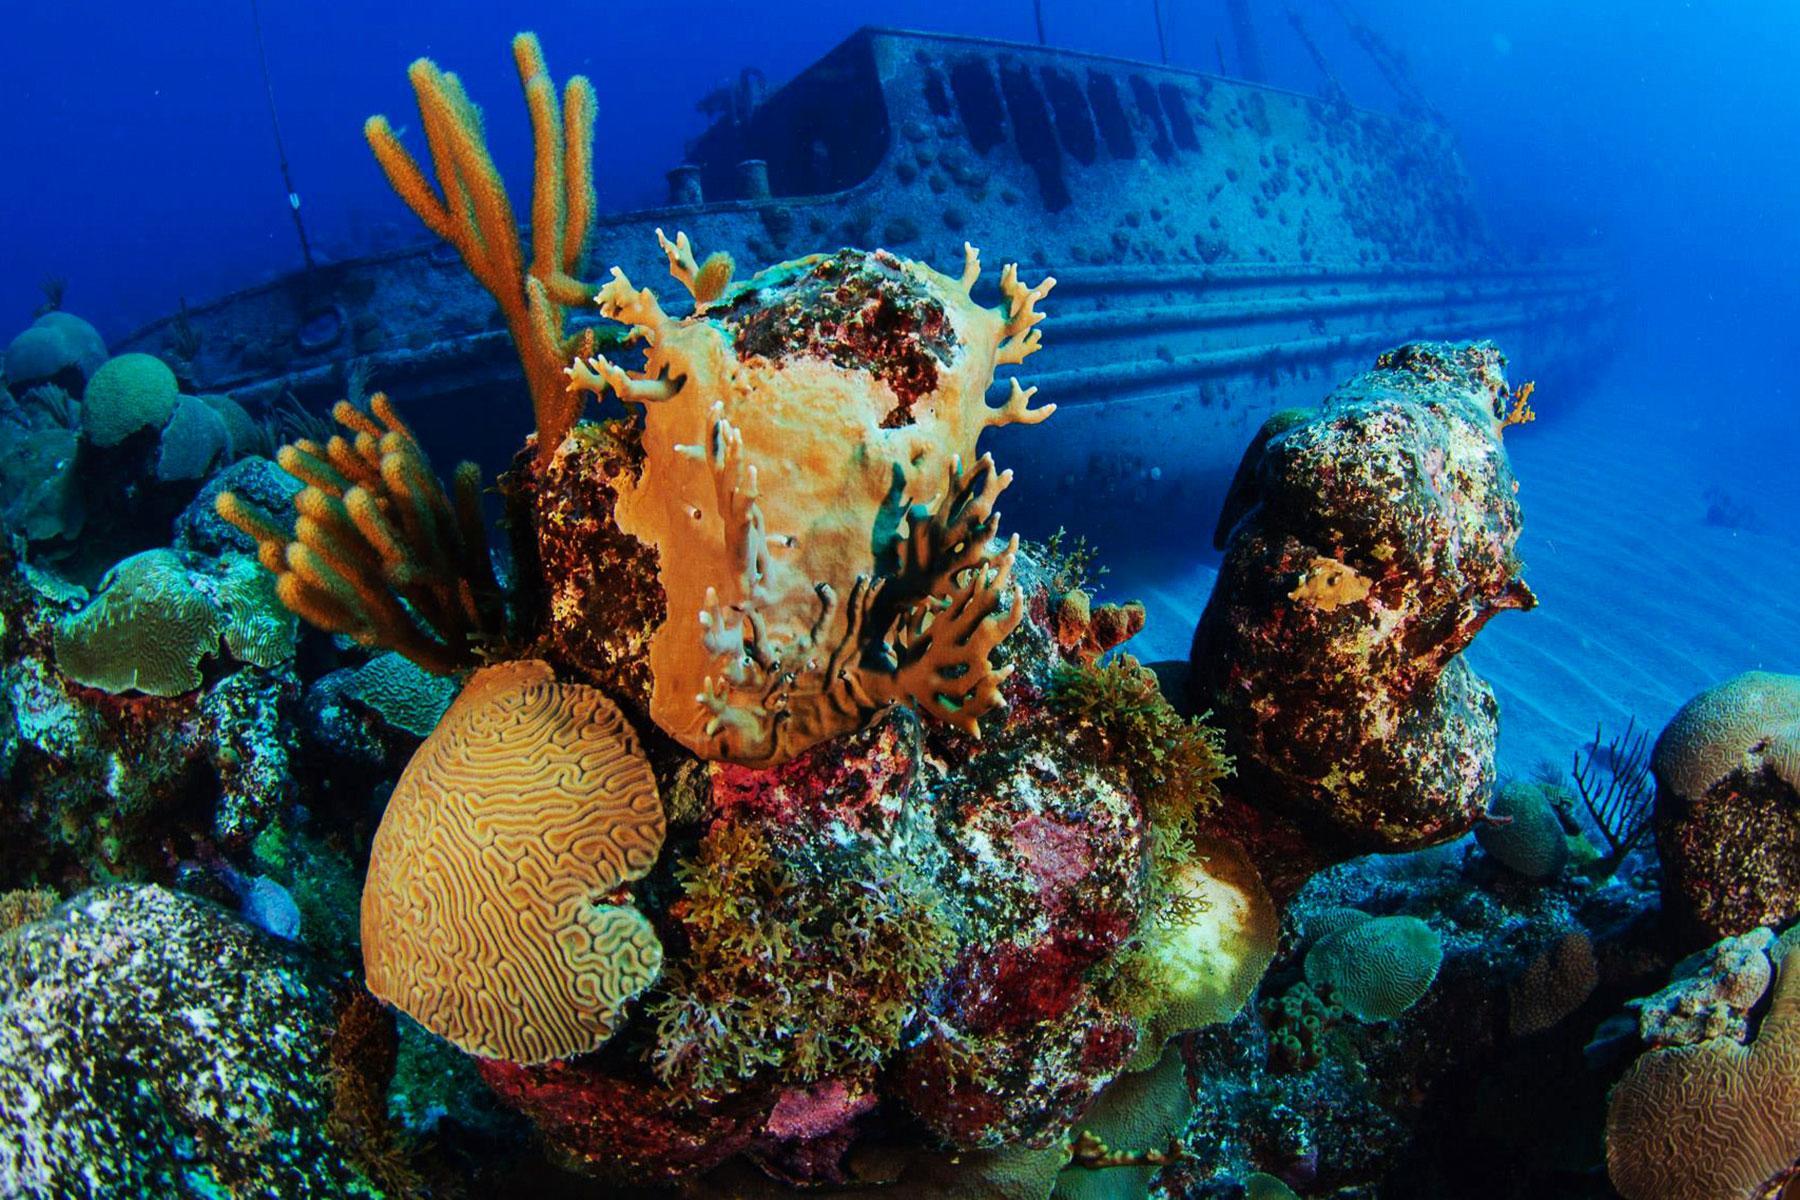 10 Caribbean Shipwrecks